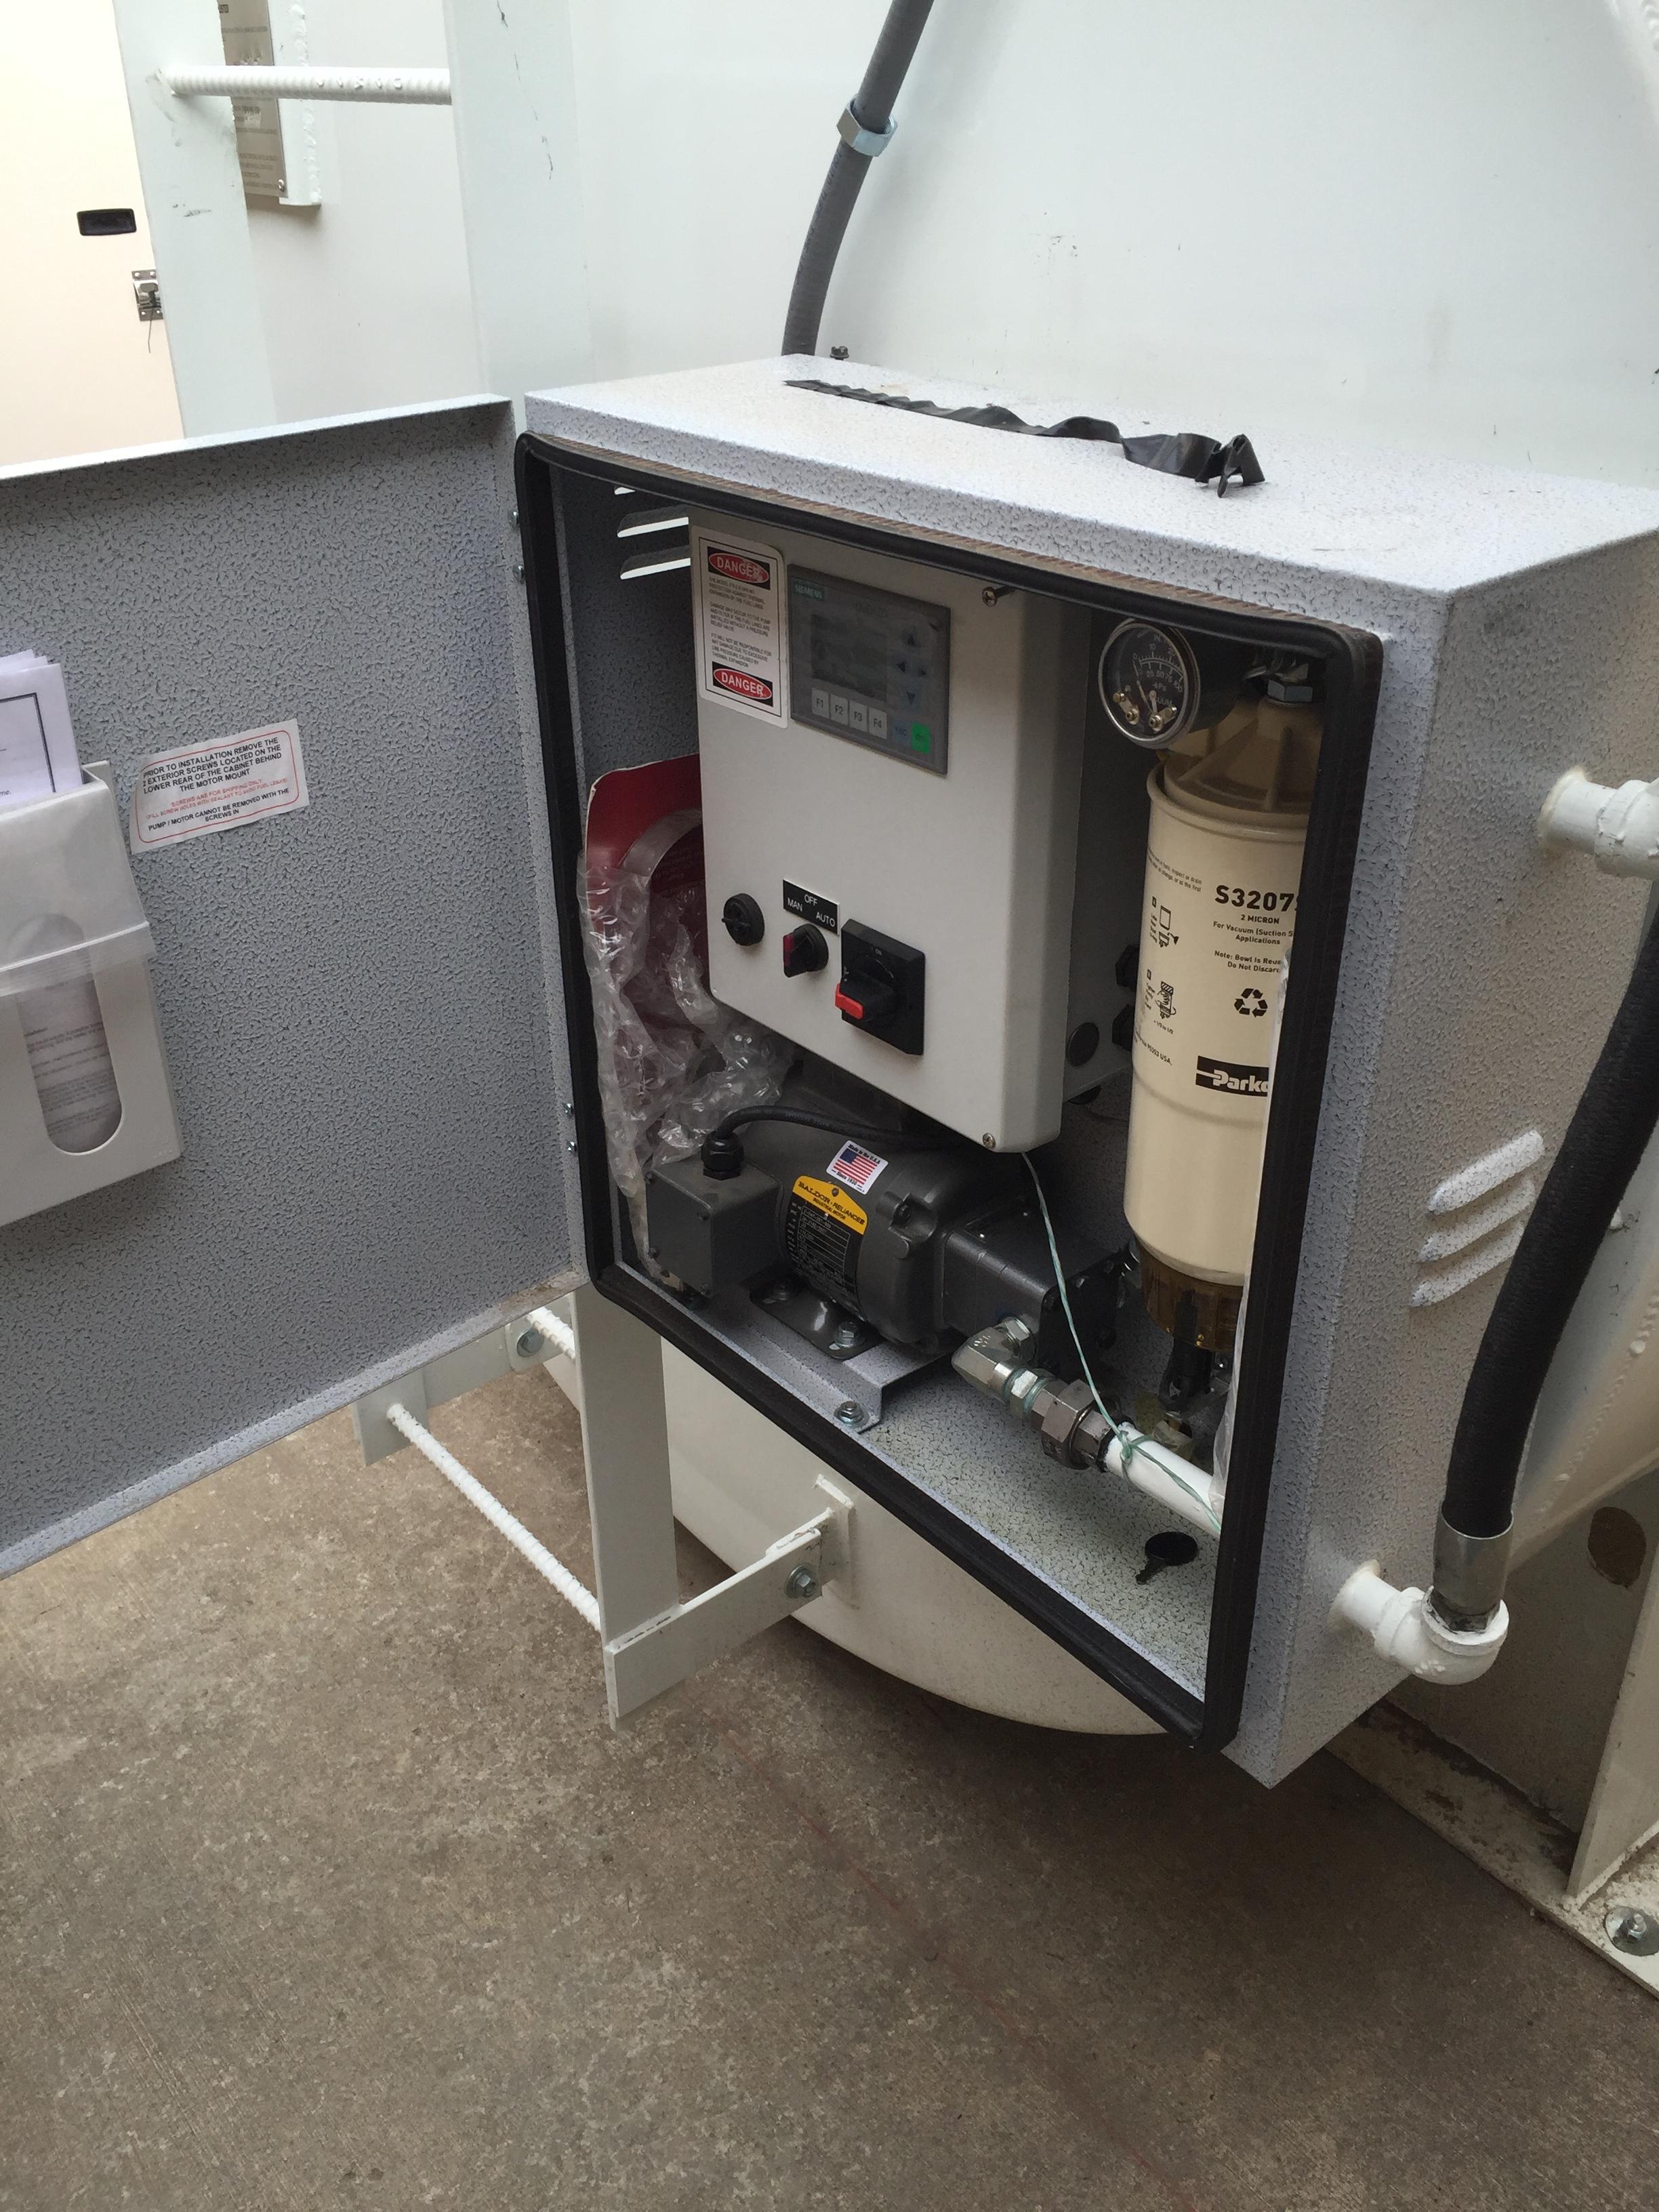 FTI-2.8 Fuel Maintenance System - Avista Utilities